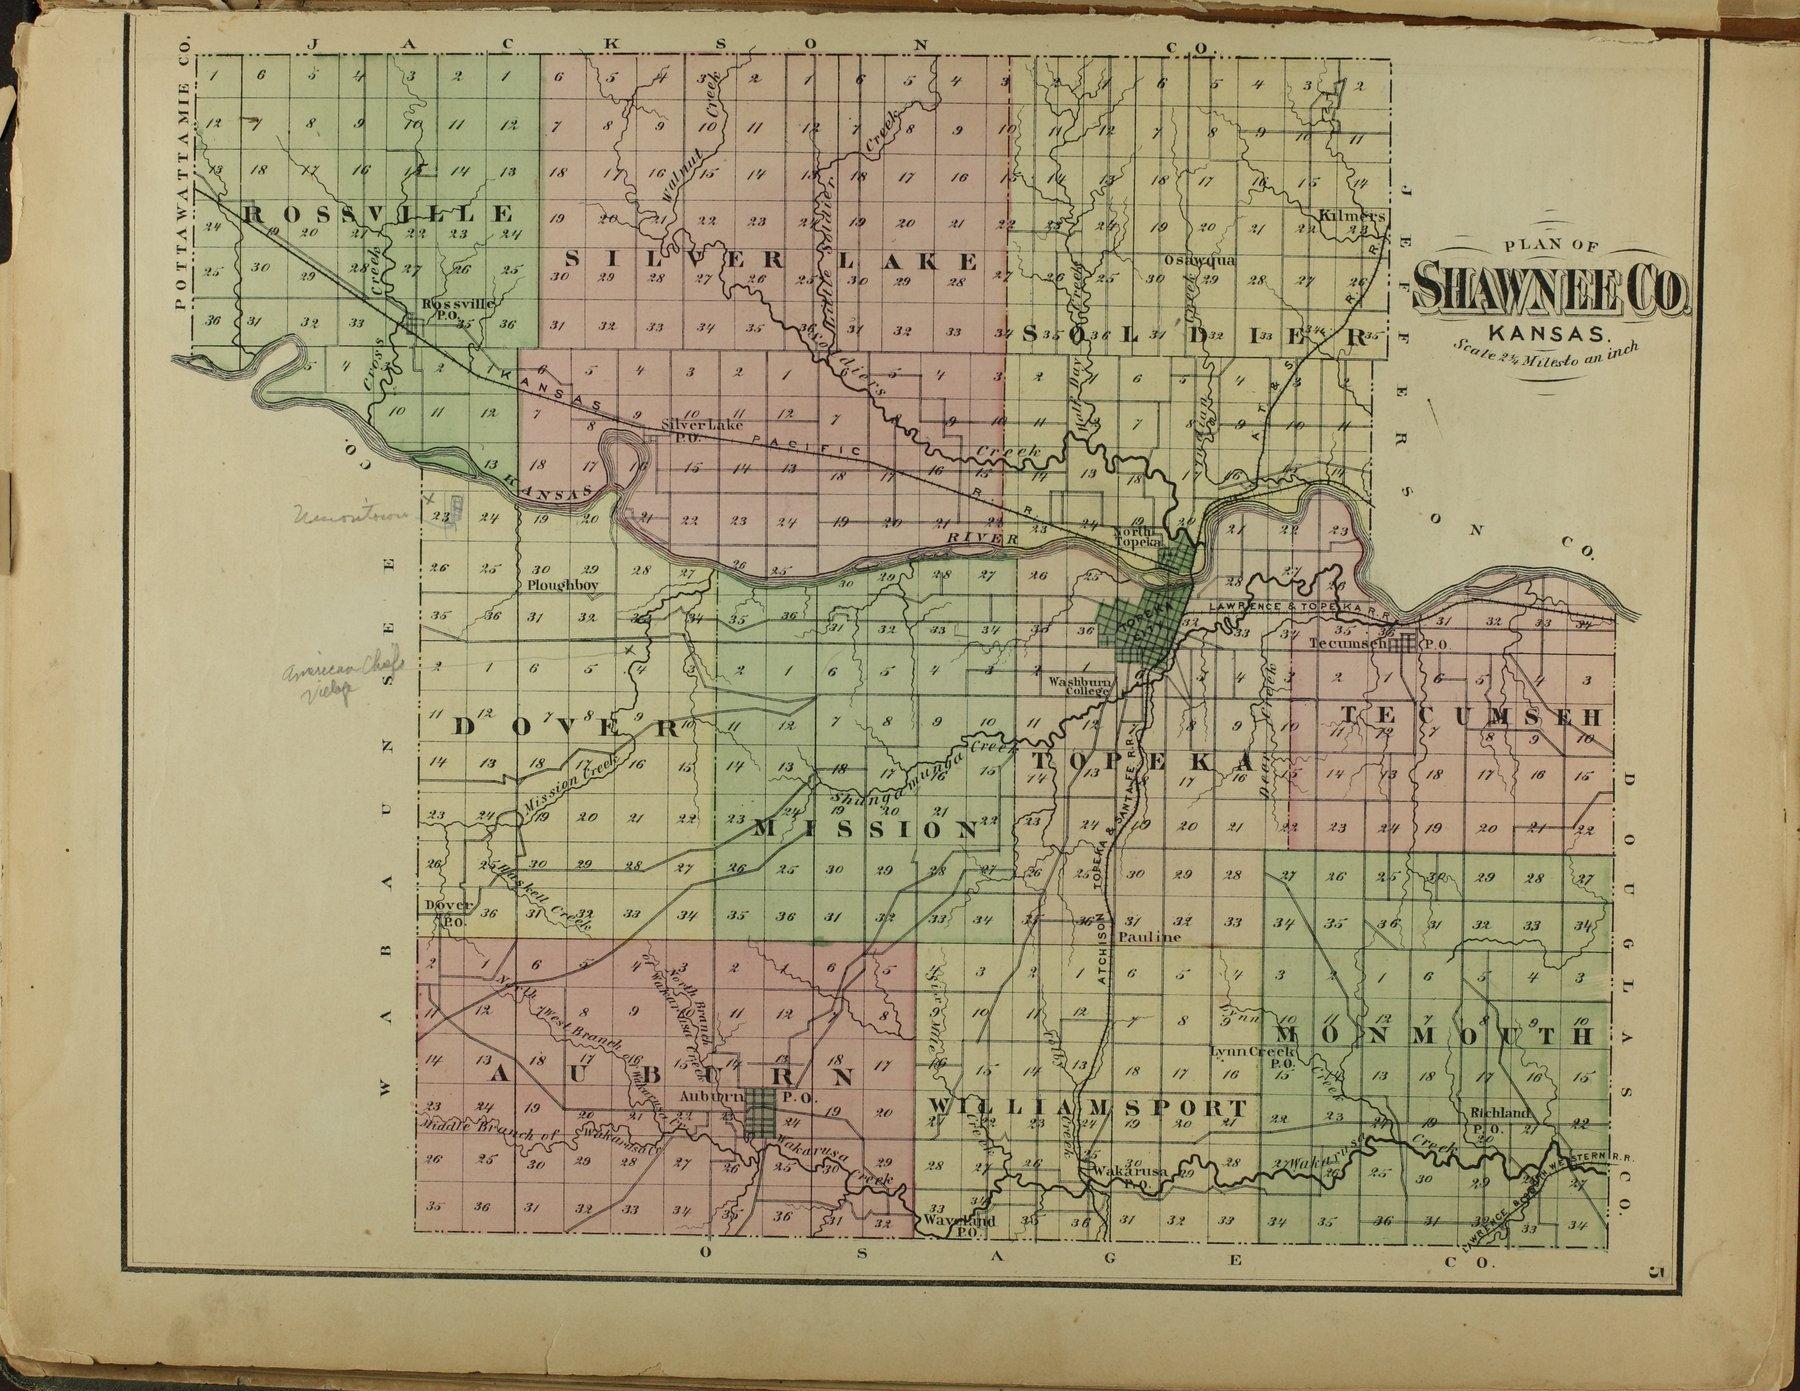 Atlas of Shawnee County, Kansas - 5